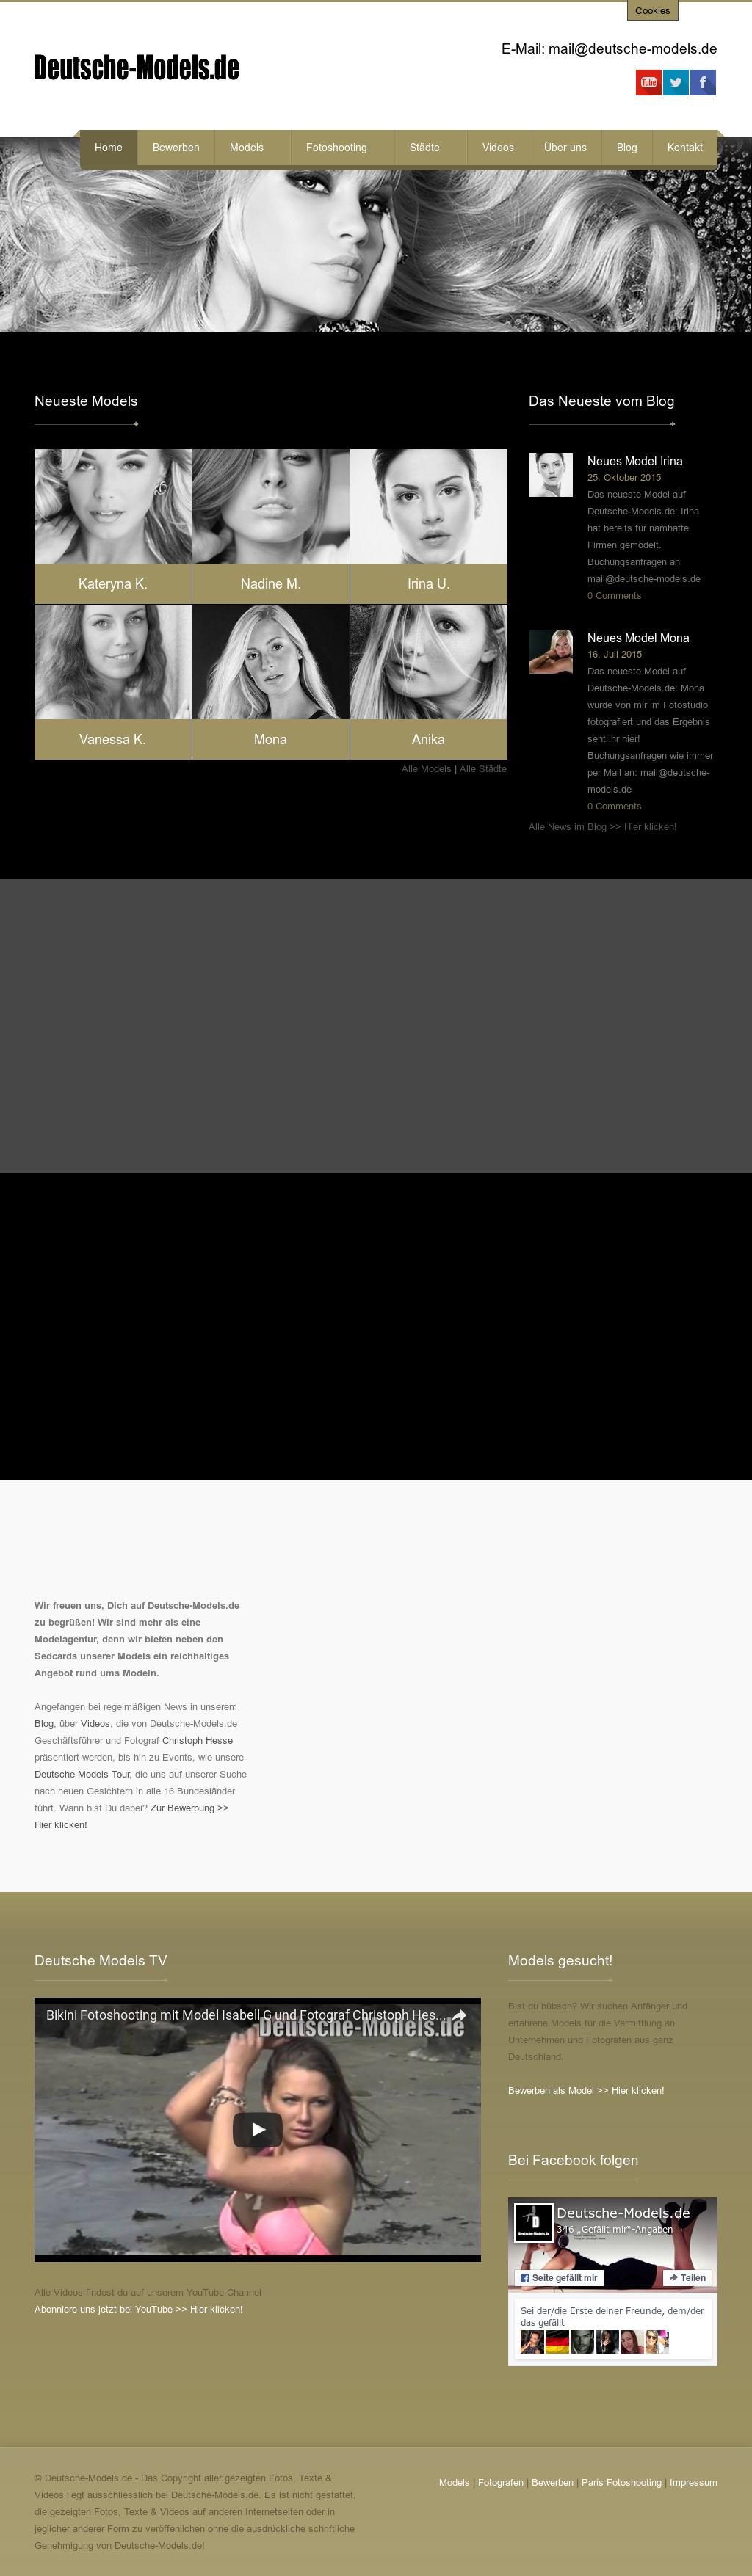 deutsche models competitors revenue and employees owler company profile - Bewerbung Model